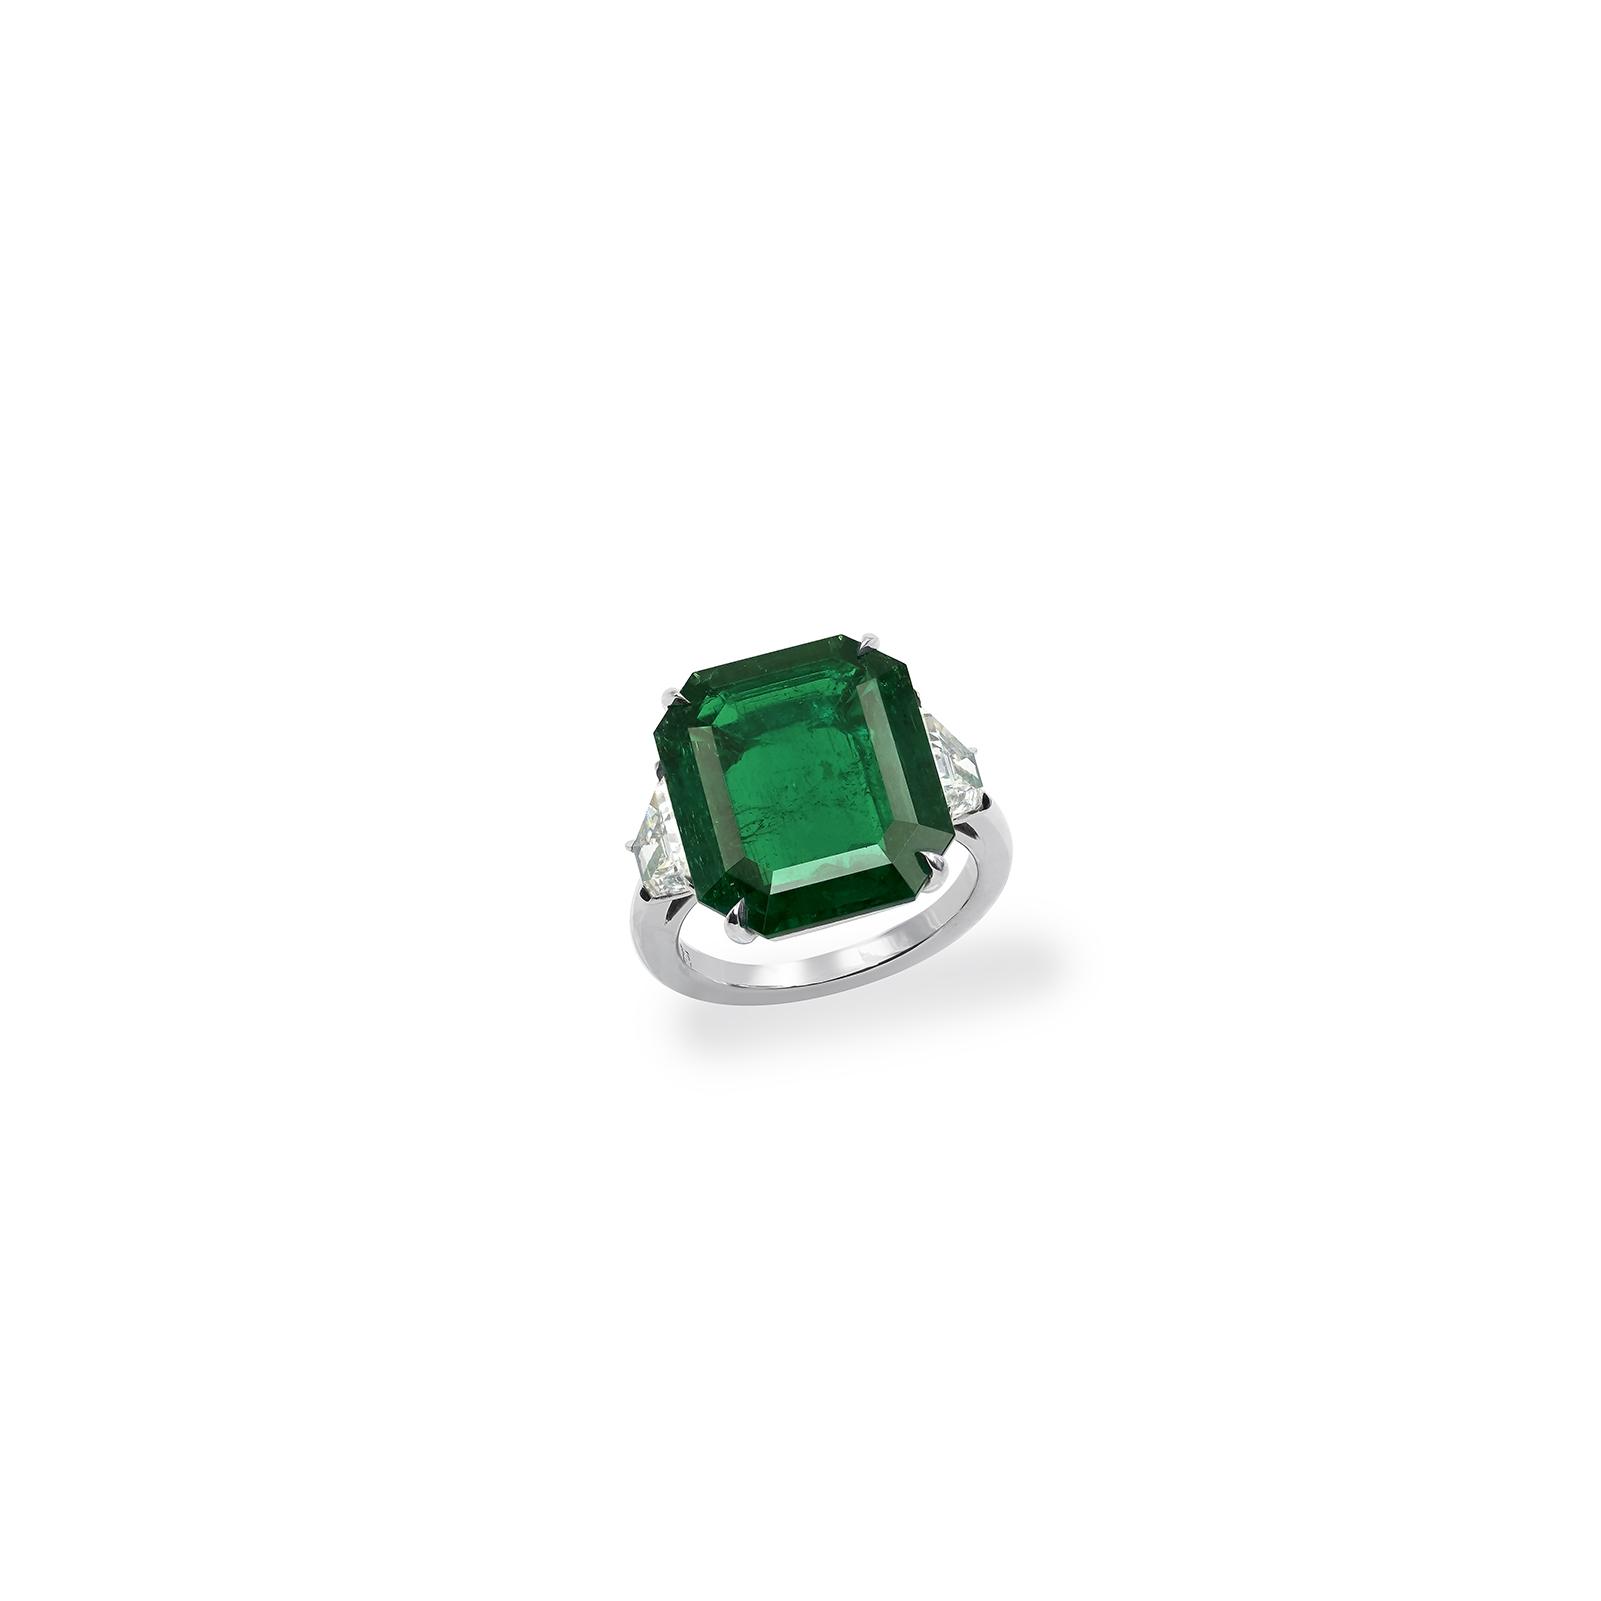 9 carat emerald cut ring